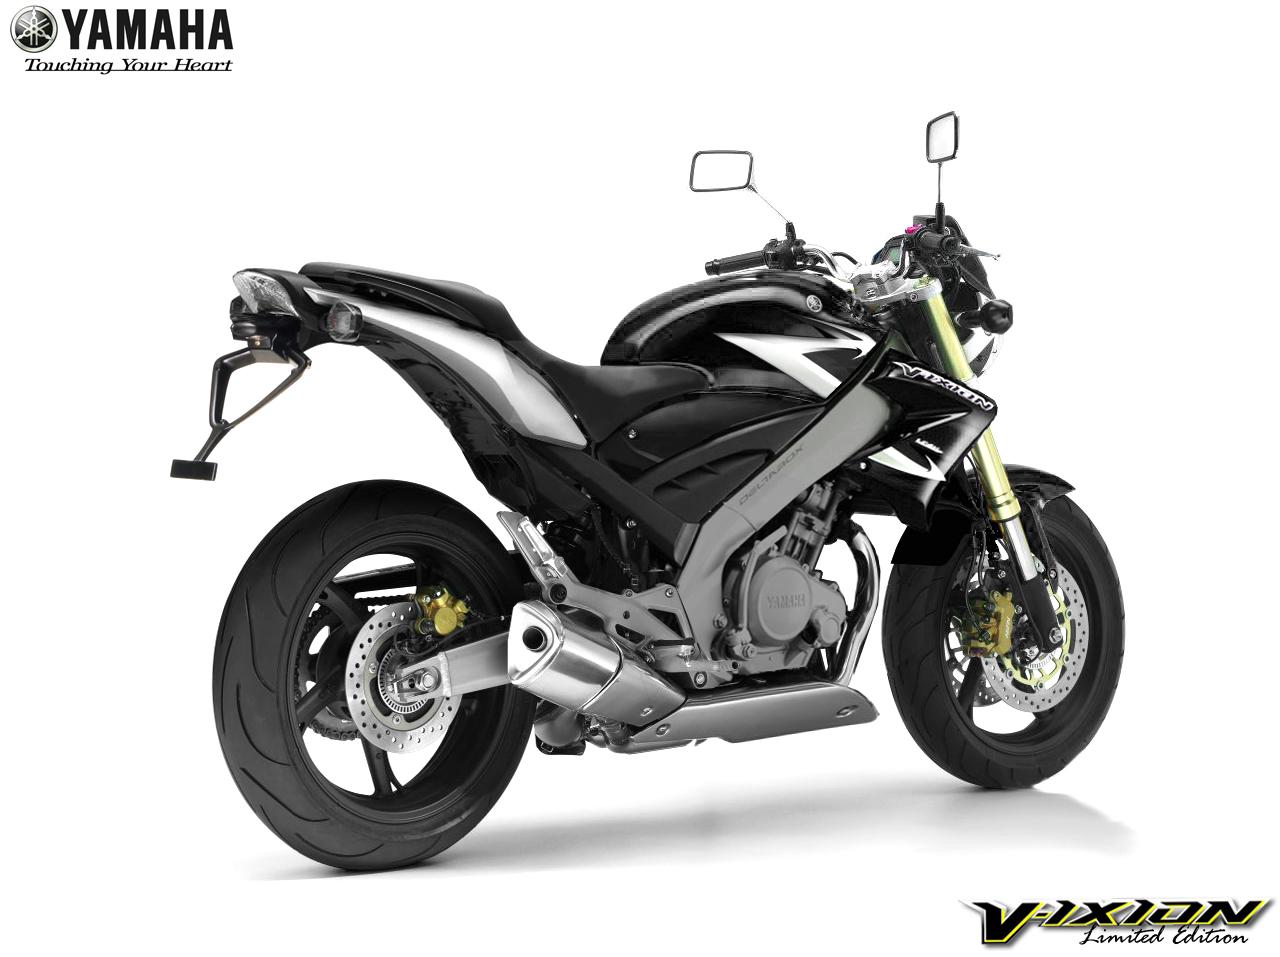 Modif Ringan Yamaha Vixion